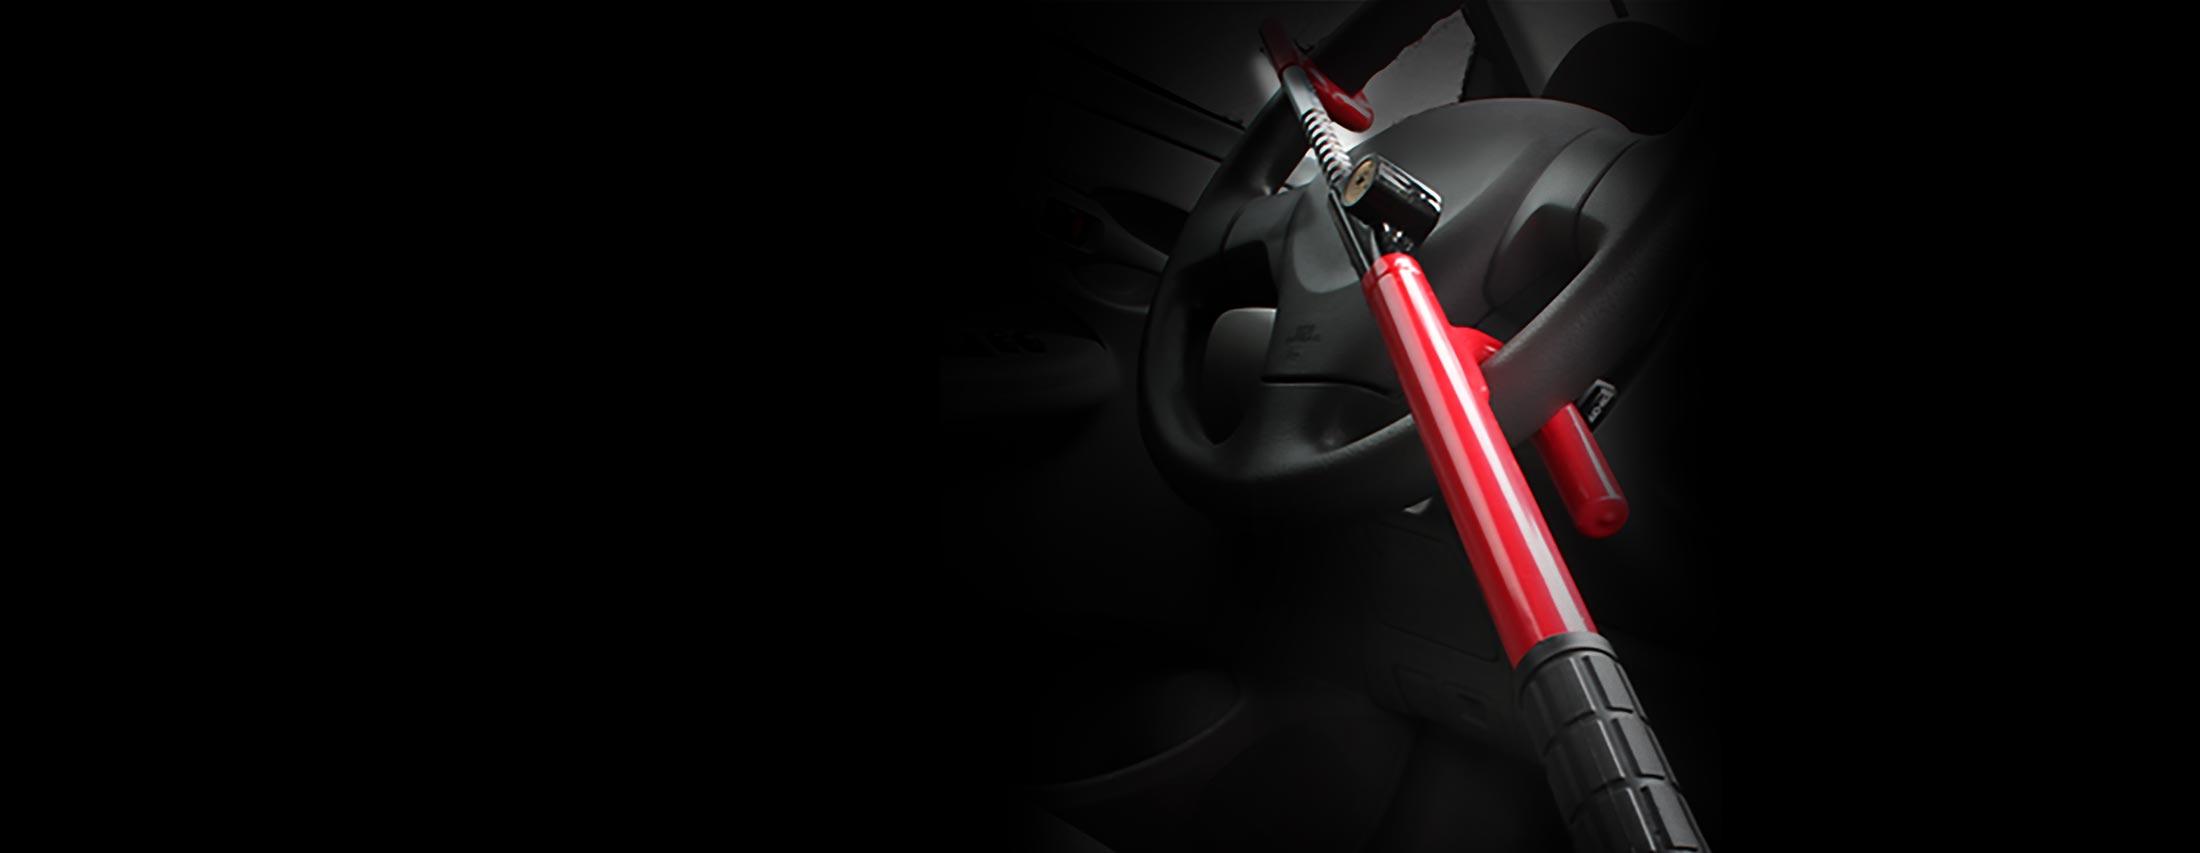 Auto Steering Wheel Security Lock